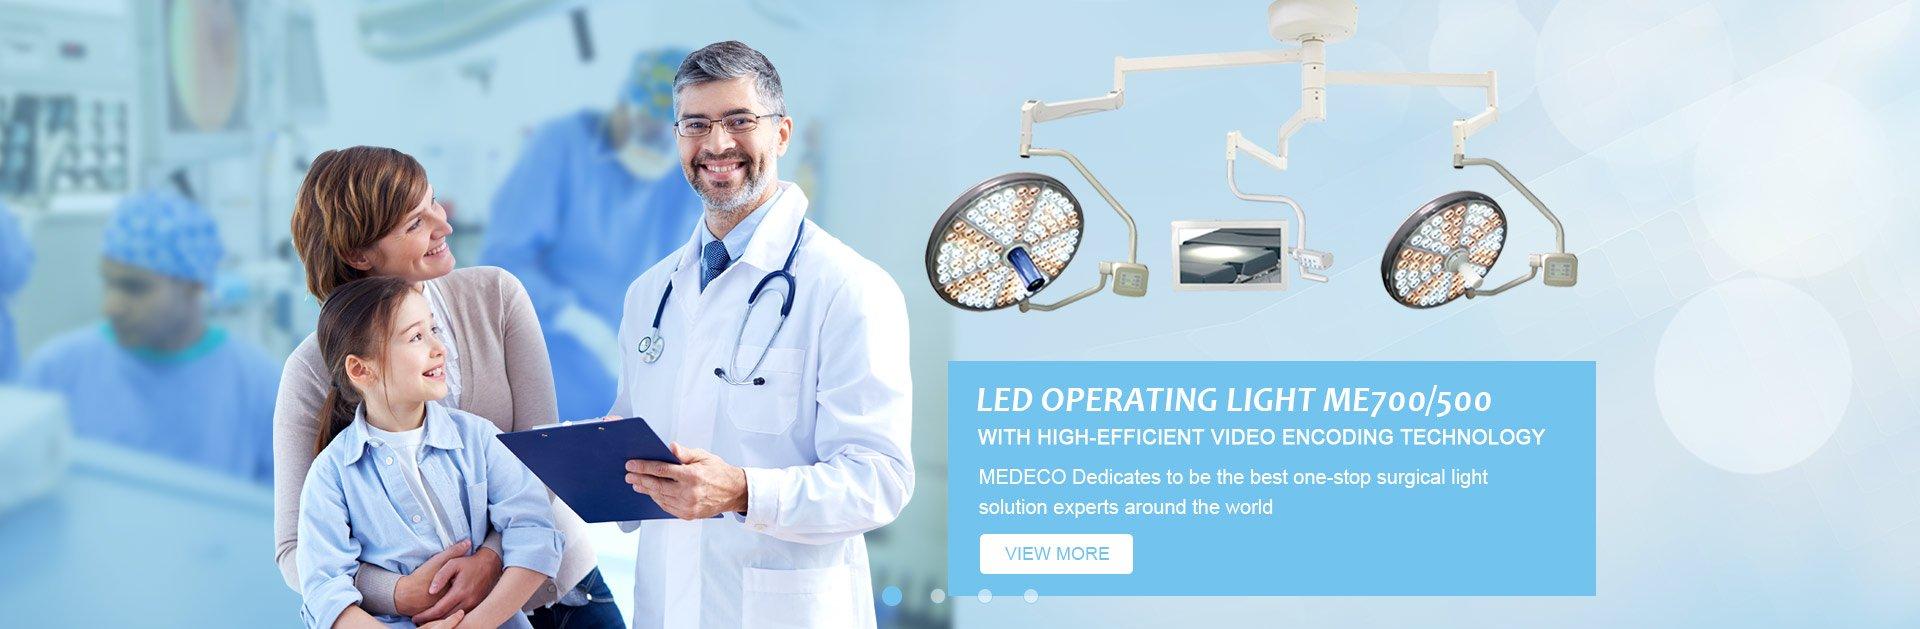 LED Operating Lamp